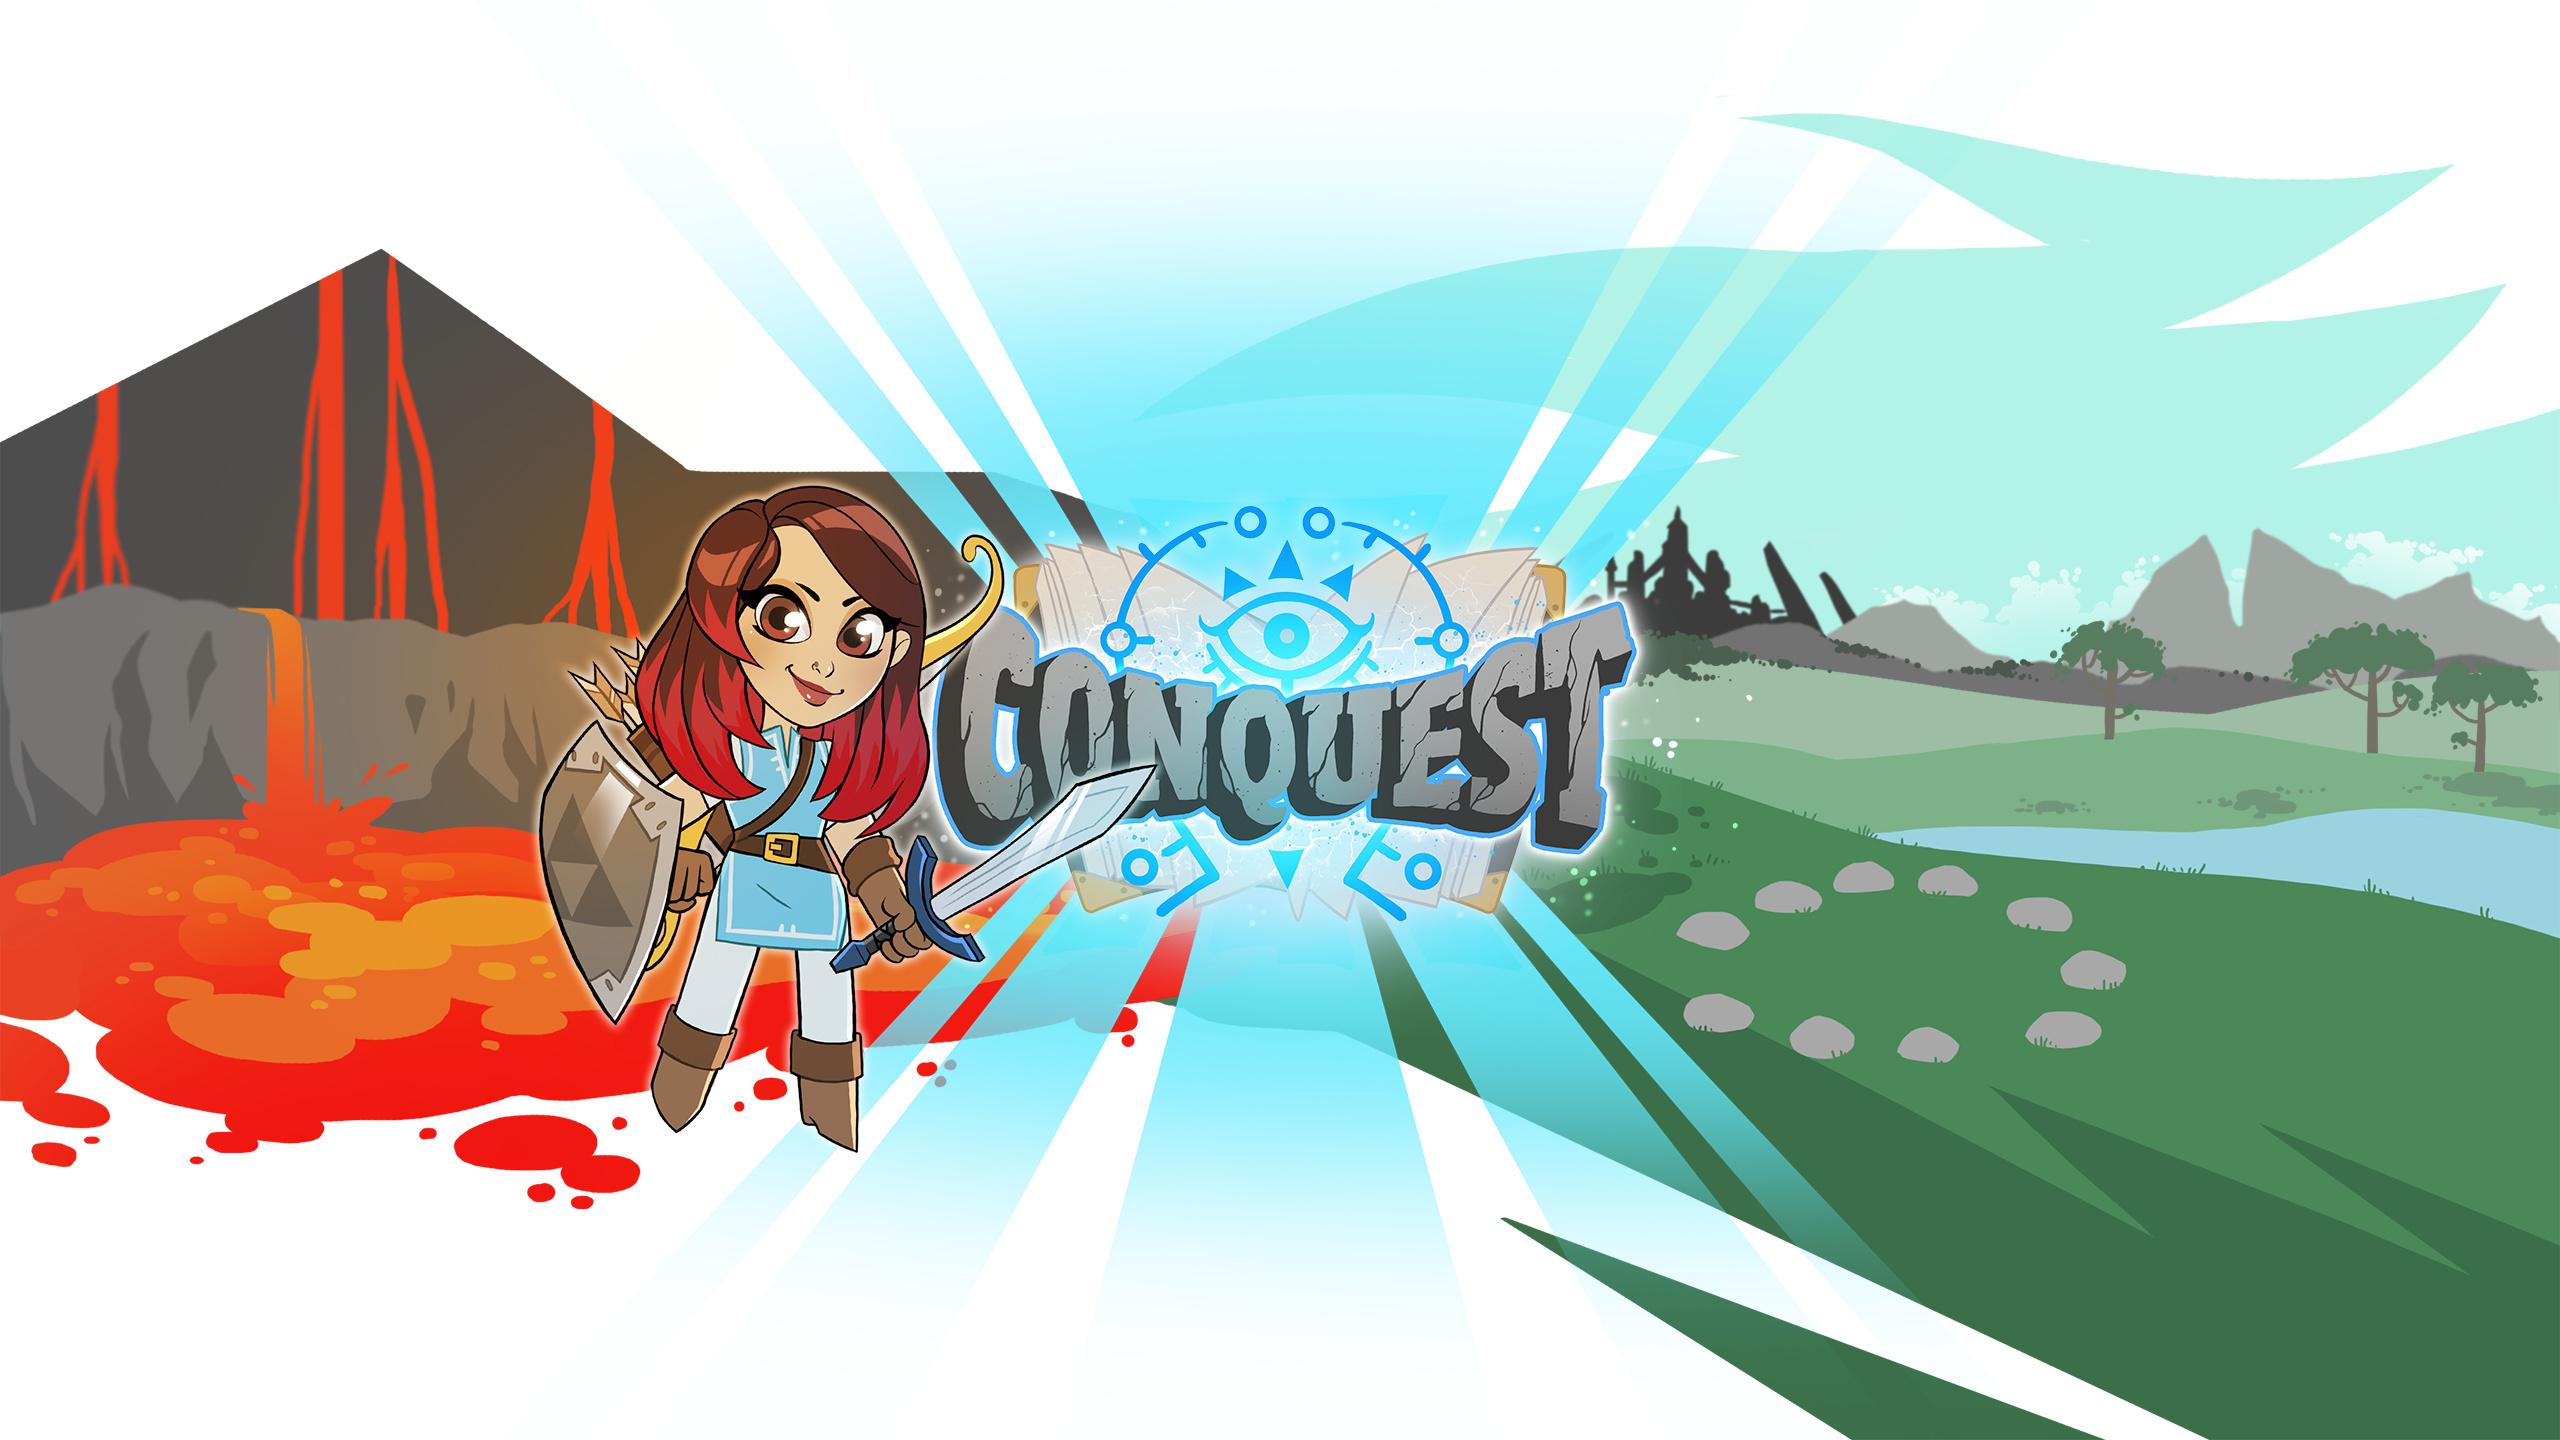 Conquest banner 2017 Apr